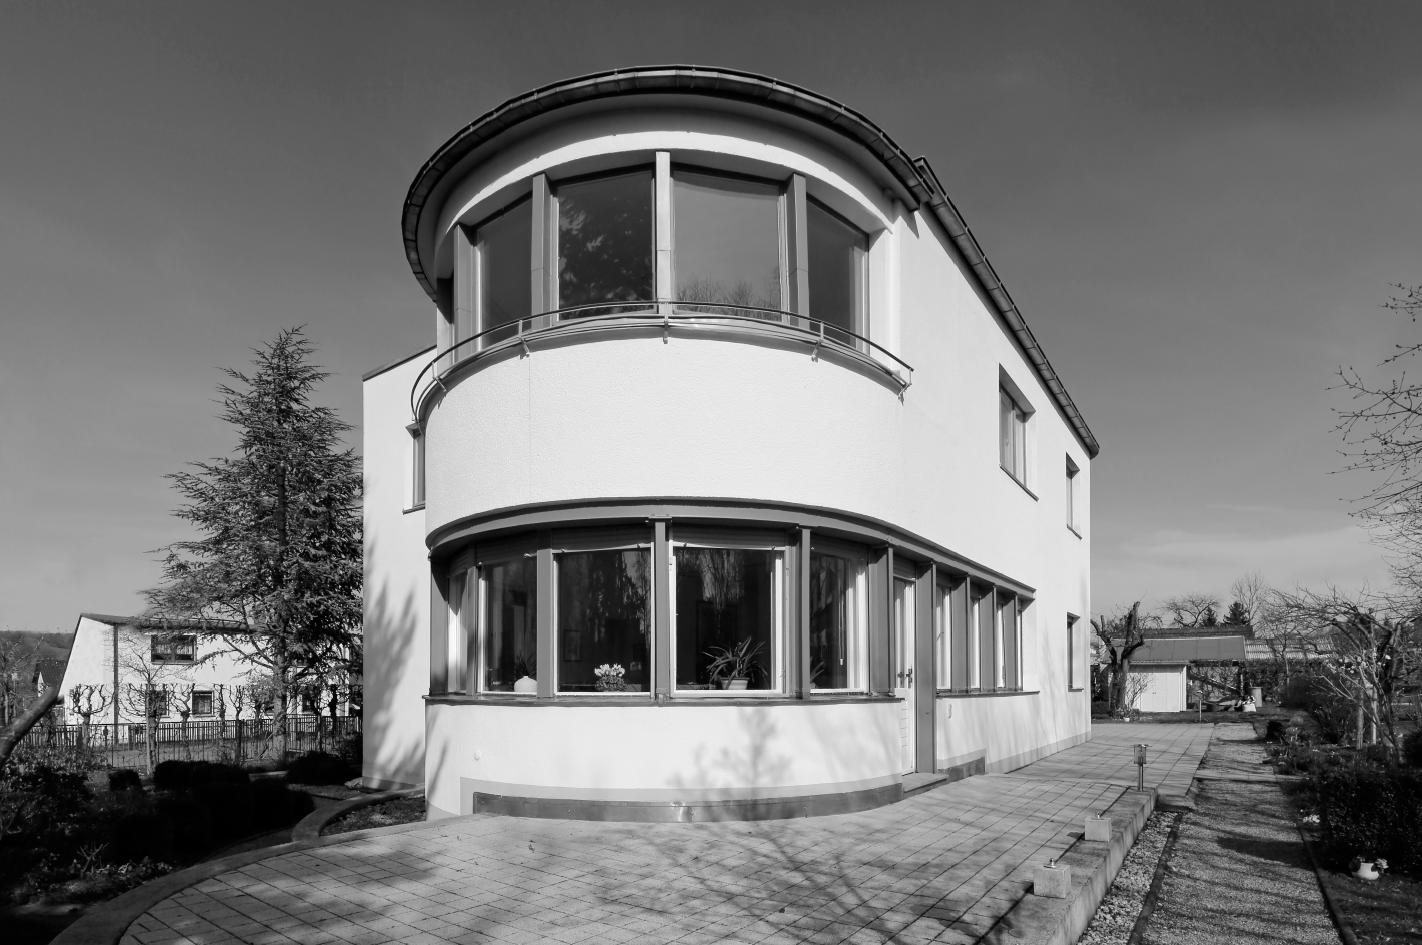 kopie vonkopie vonbau1haus newsletter 006 2017 norwegen. Black Bedroom Furniture Sets. Home Design Ideas